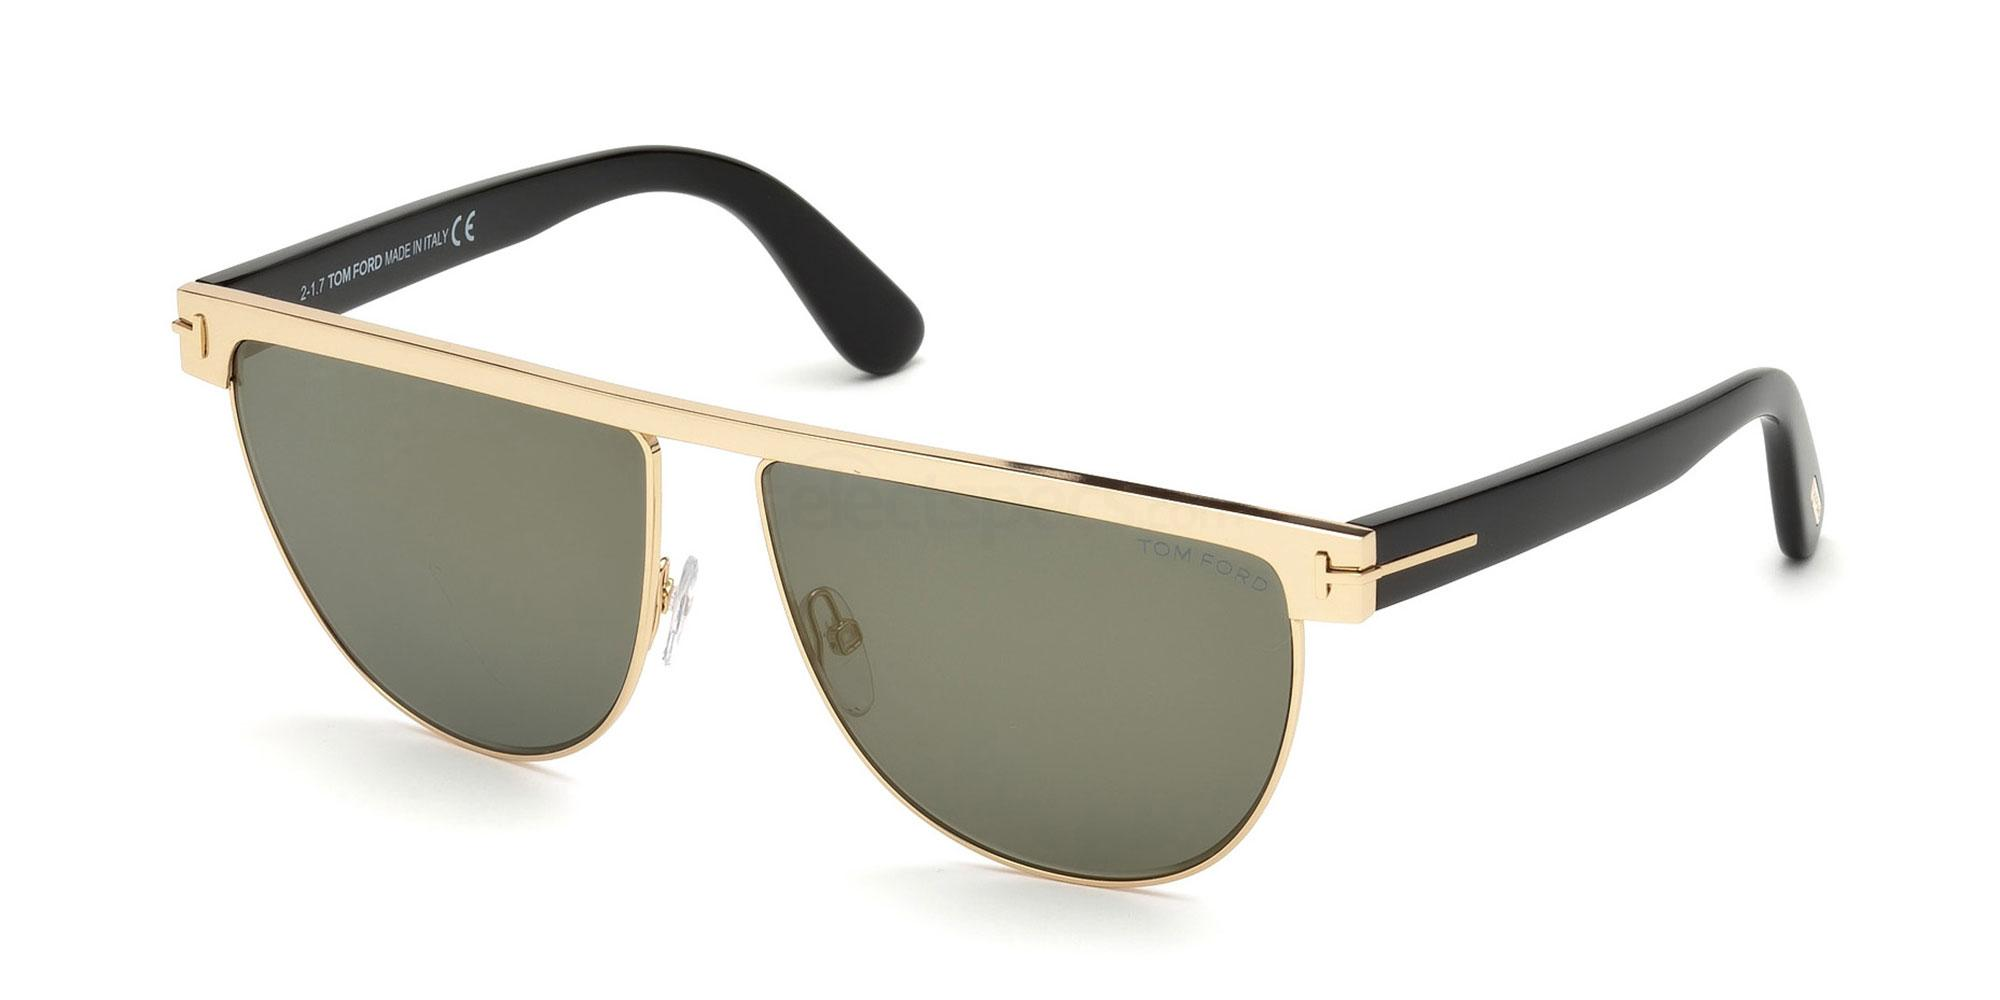 28C FT0570 Sunglasses, Tom Ford